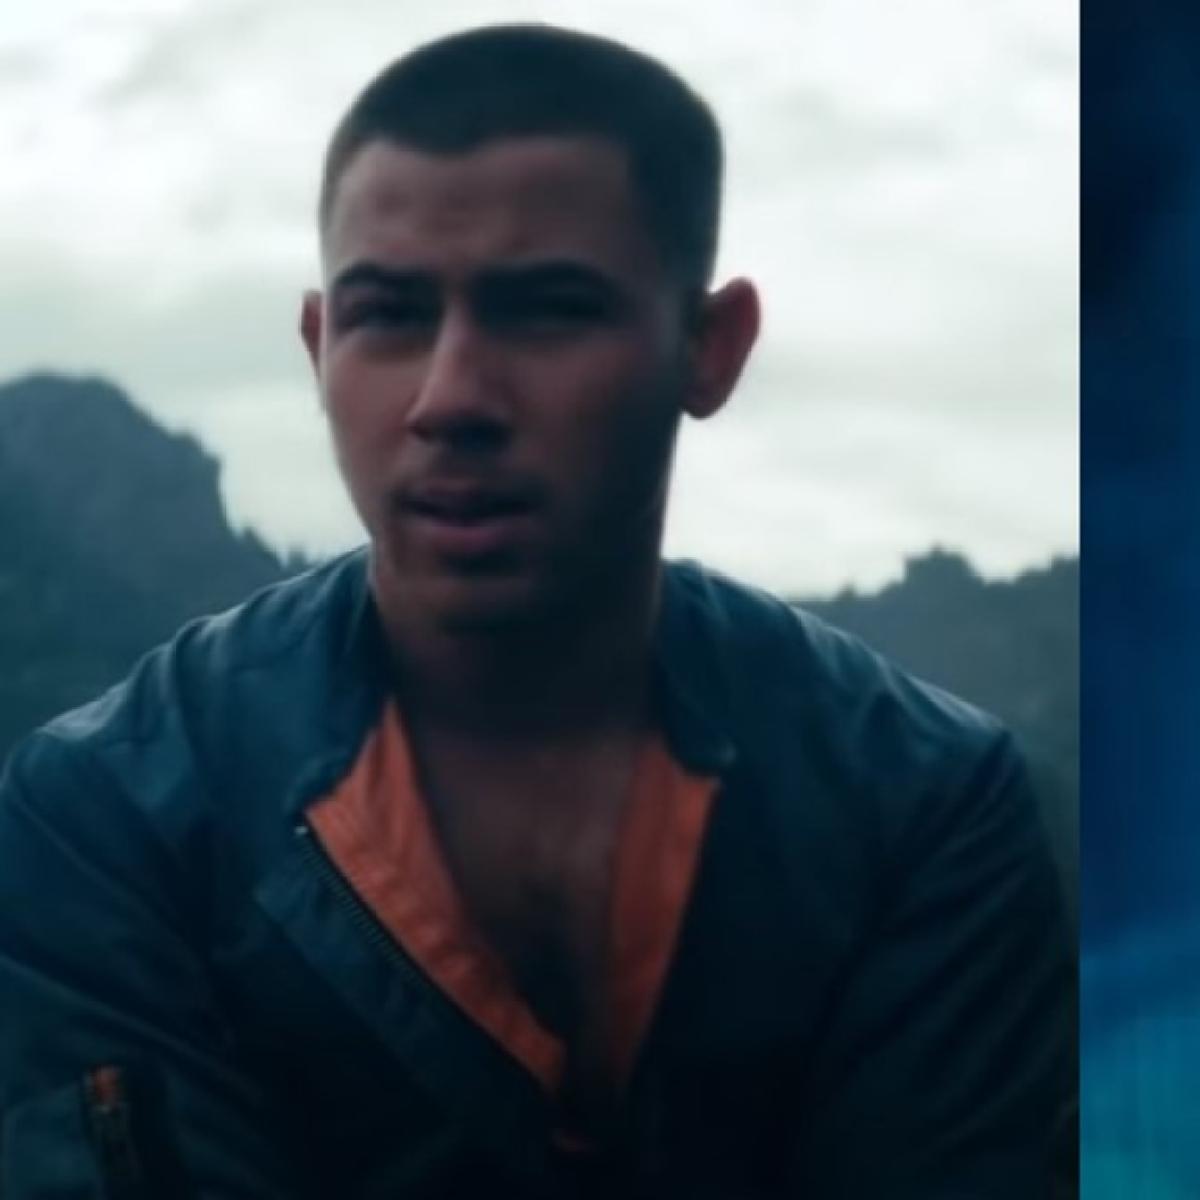 Watch: Priyanka Chopra features in Nick Jonas' 'Spaceman' music video